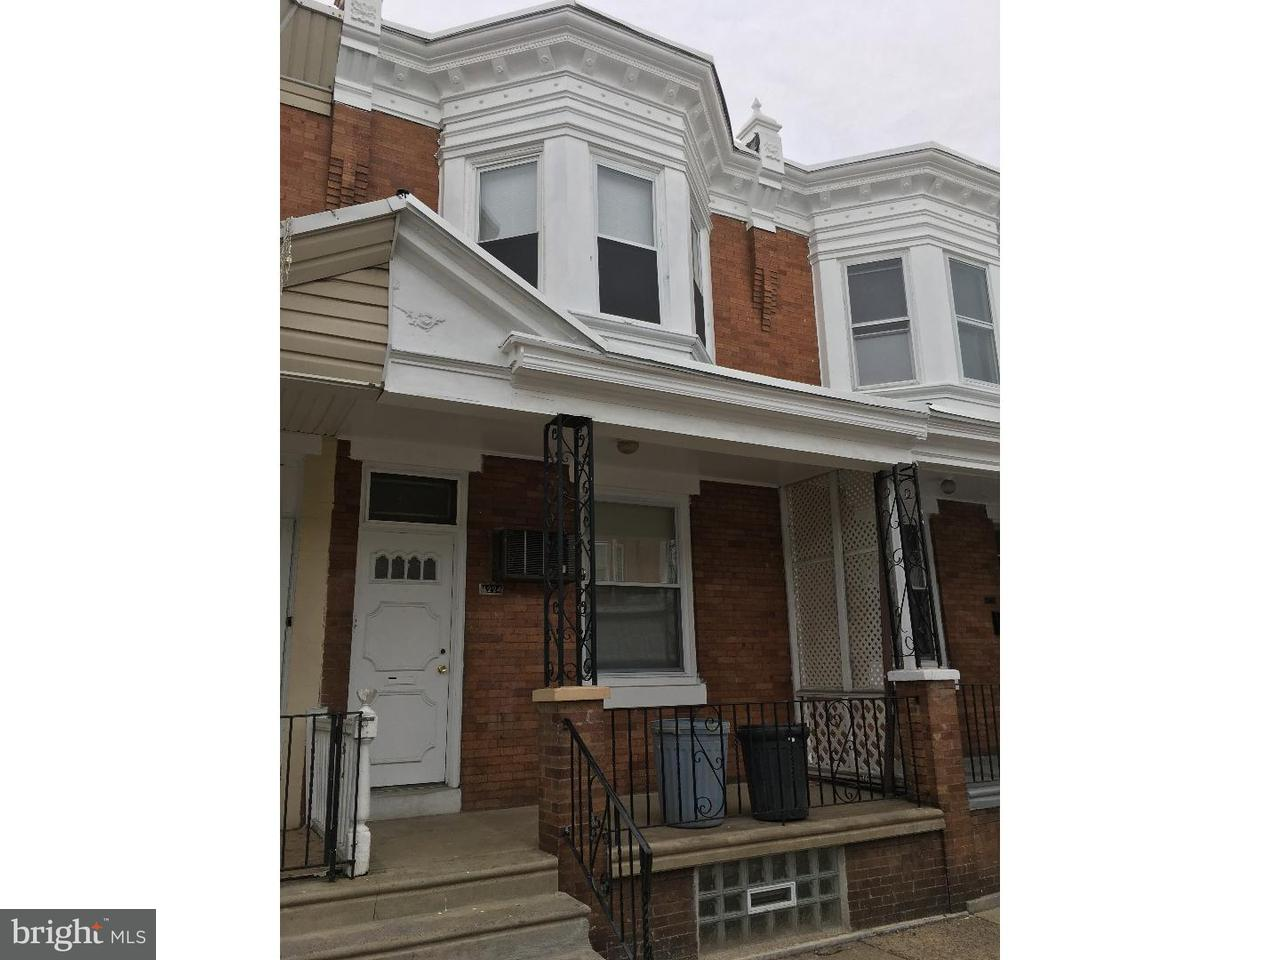 4224 N Fairhill Philadelphia, PA 19140